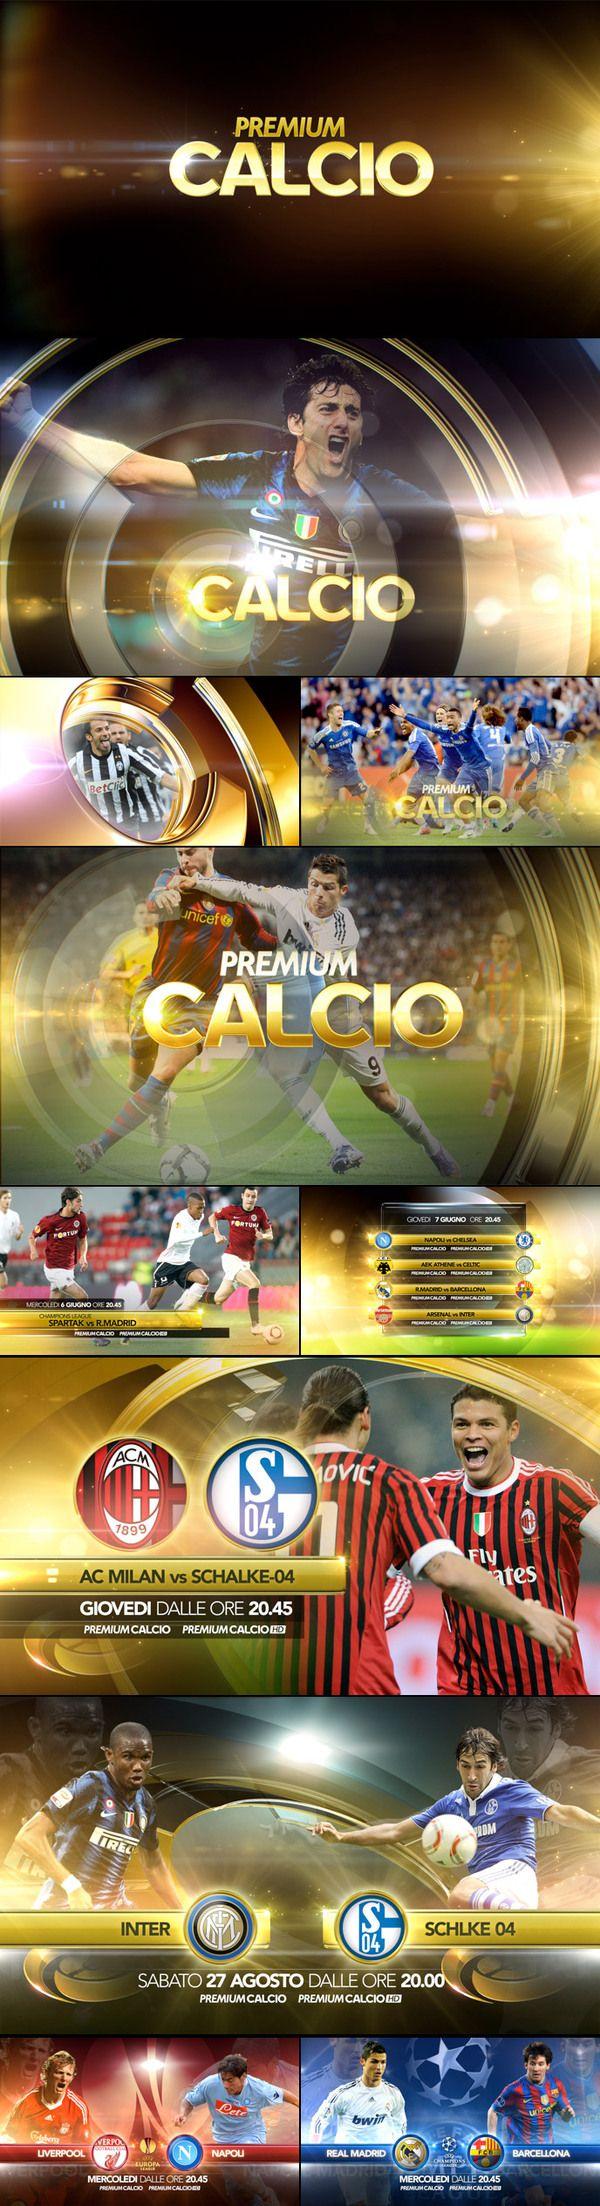 Premium calcio promo pack by Angelsign Studio , via Behance